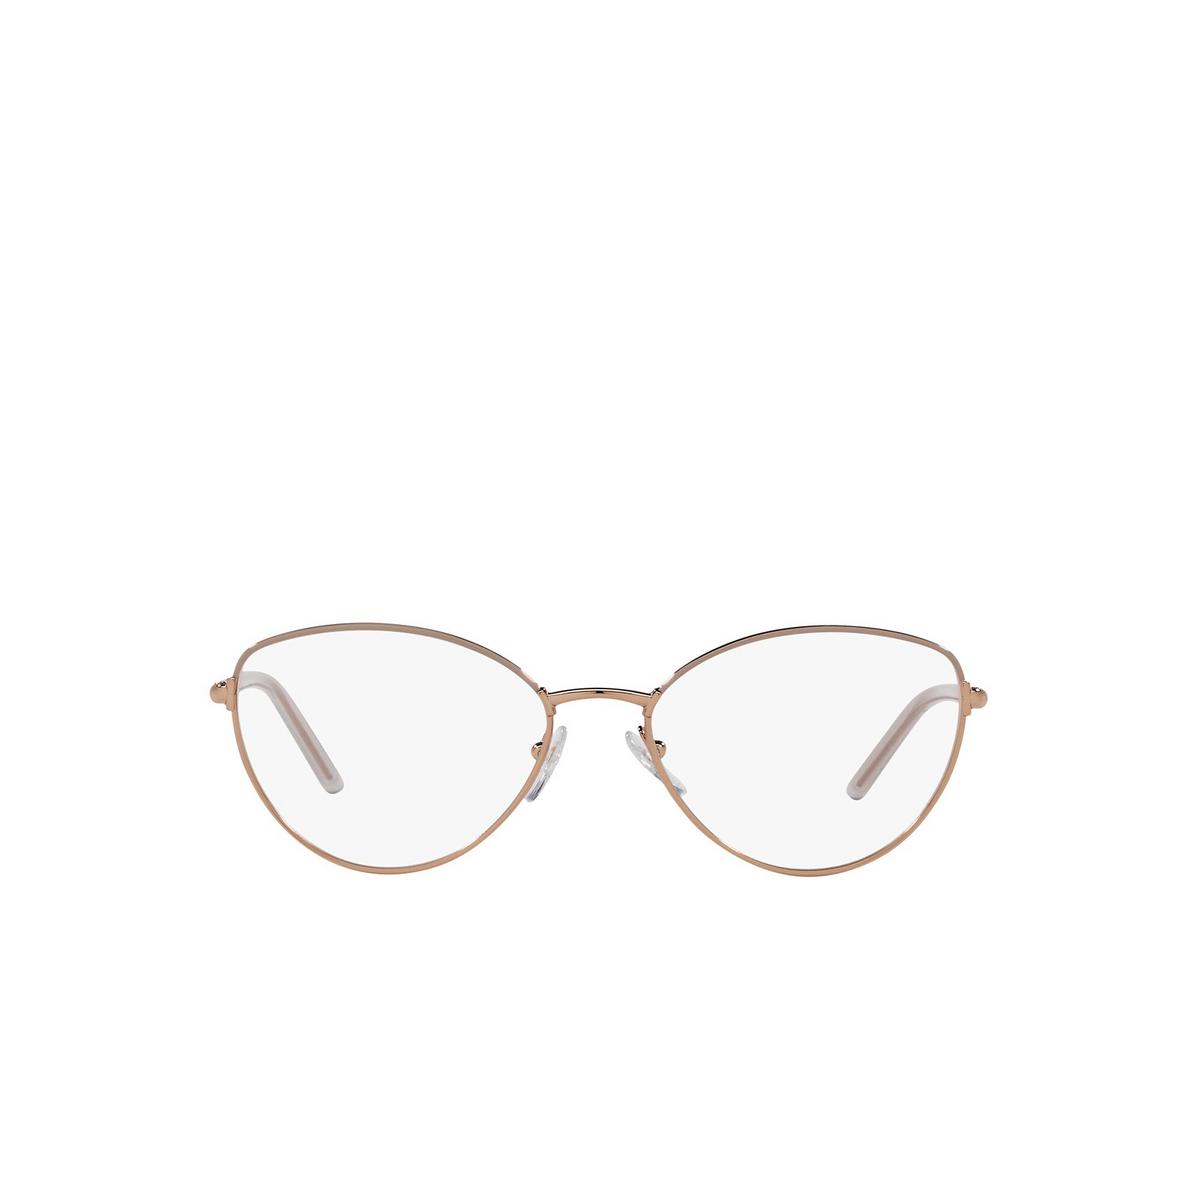 Prada® Butterfly Eyeglasses: PR 62WV color Powder / Pink Gold 05R1O1 - front view.